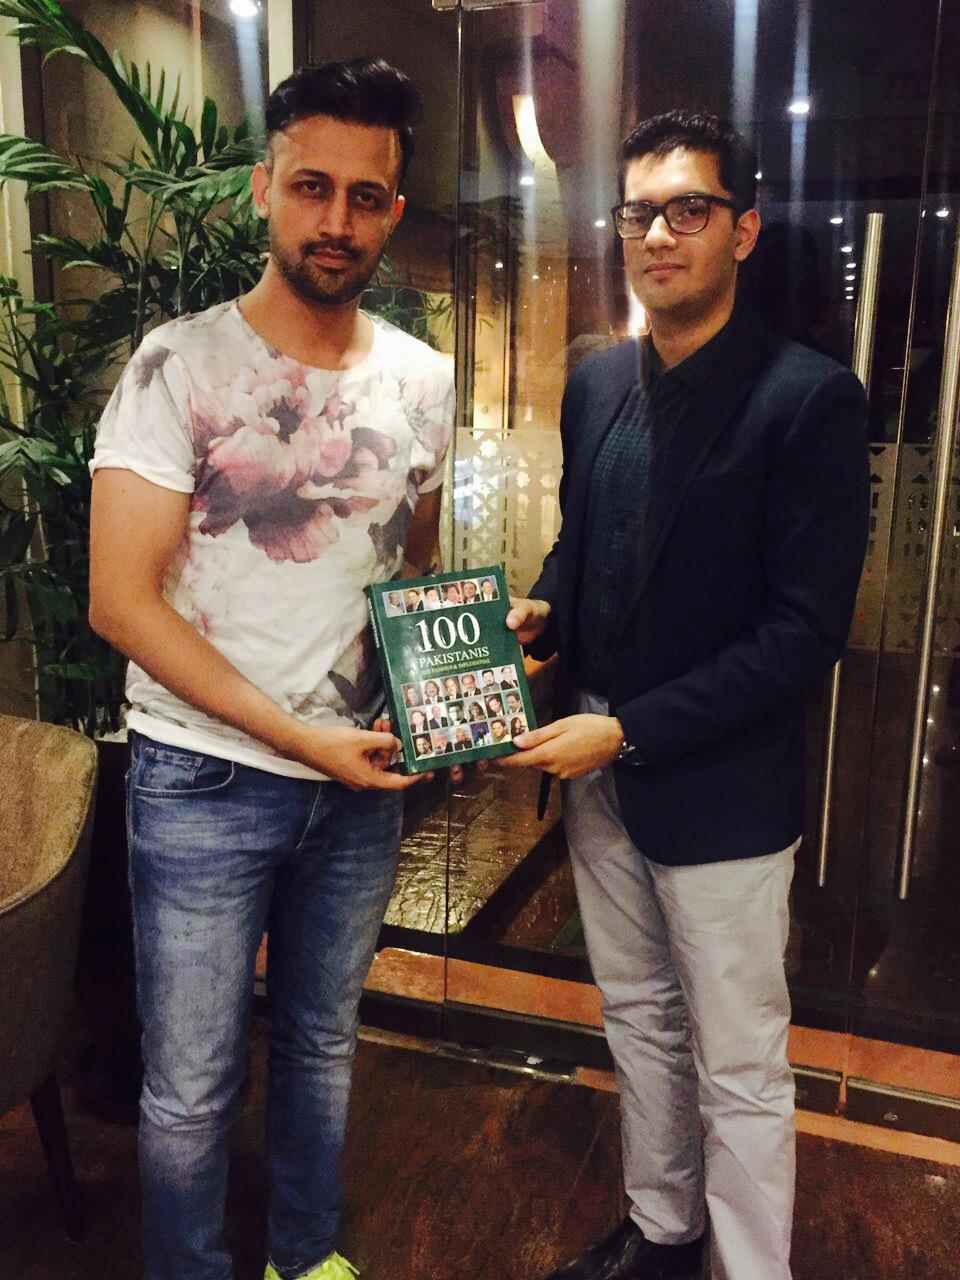 atif aslam honoured as 100 most influential pakistani